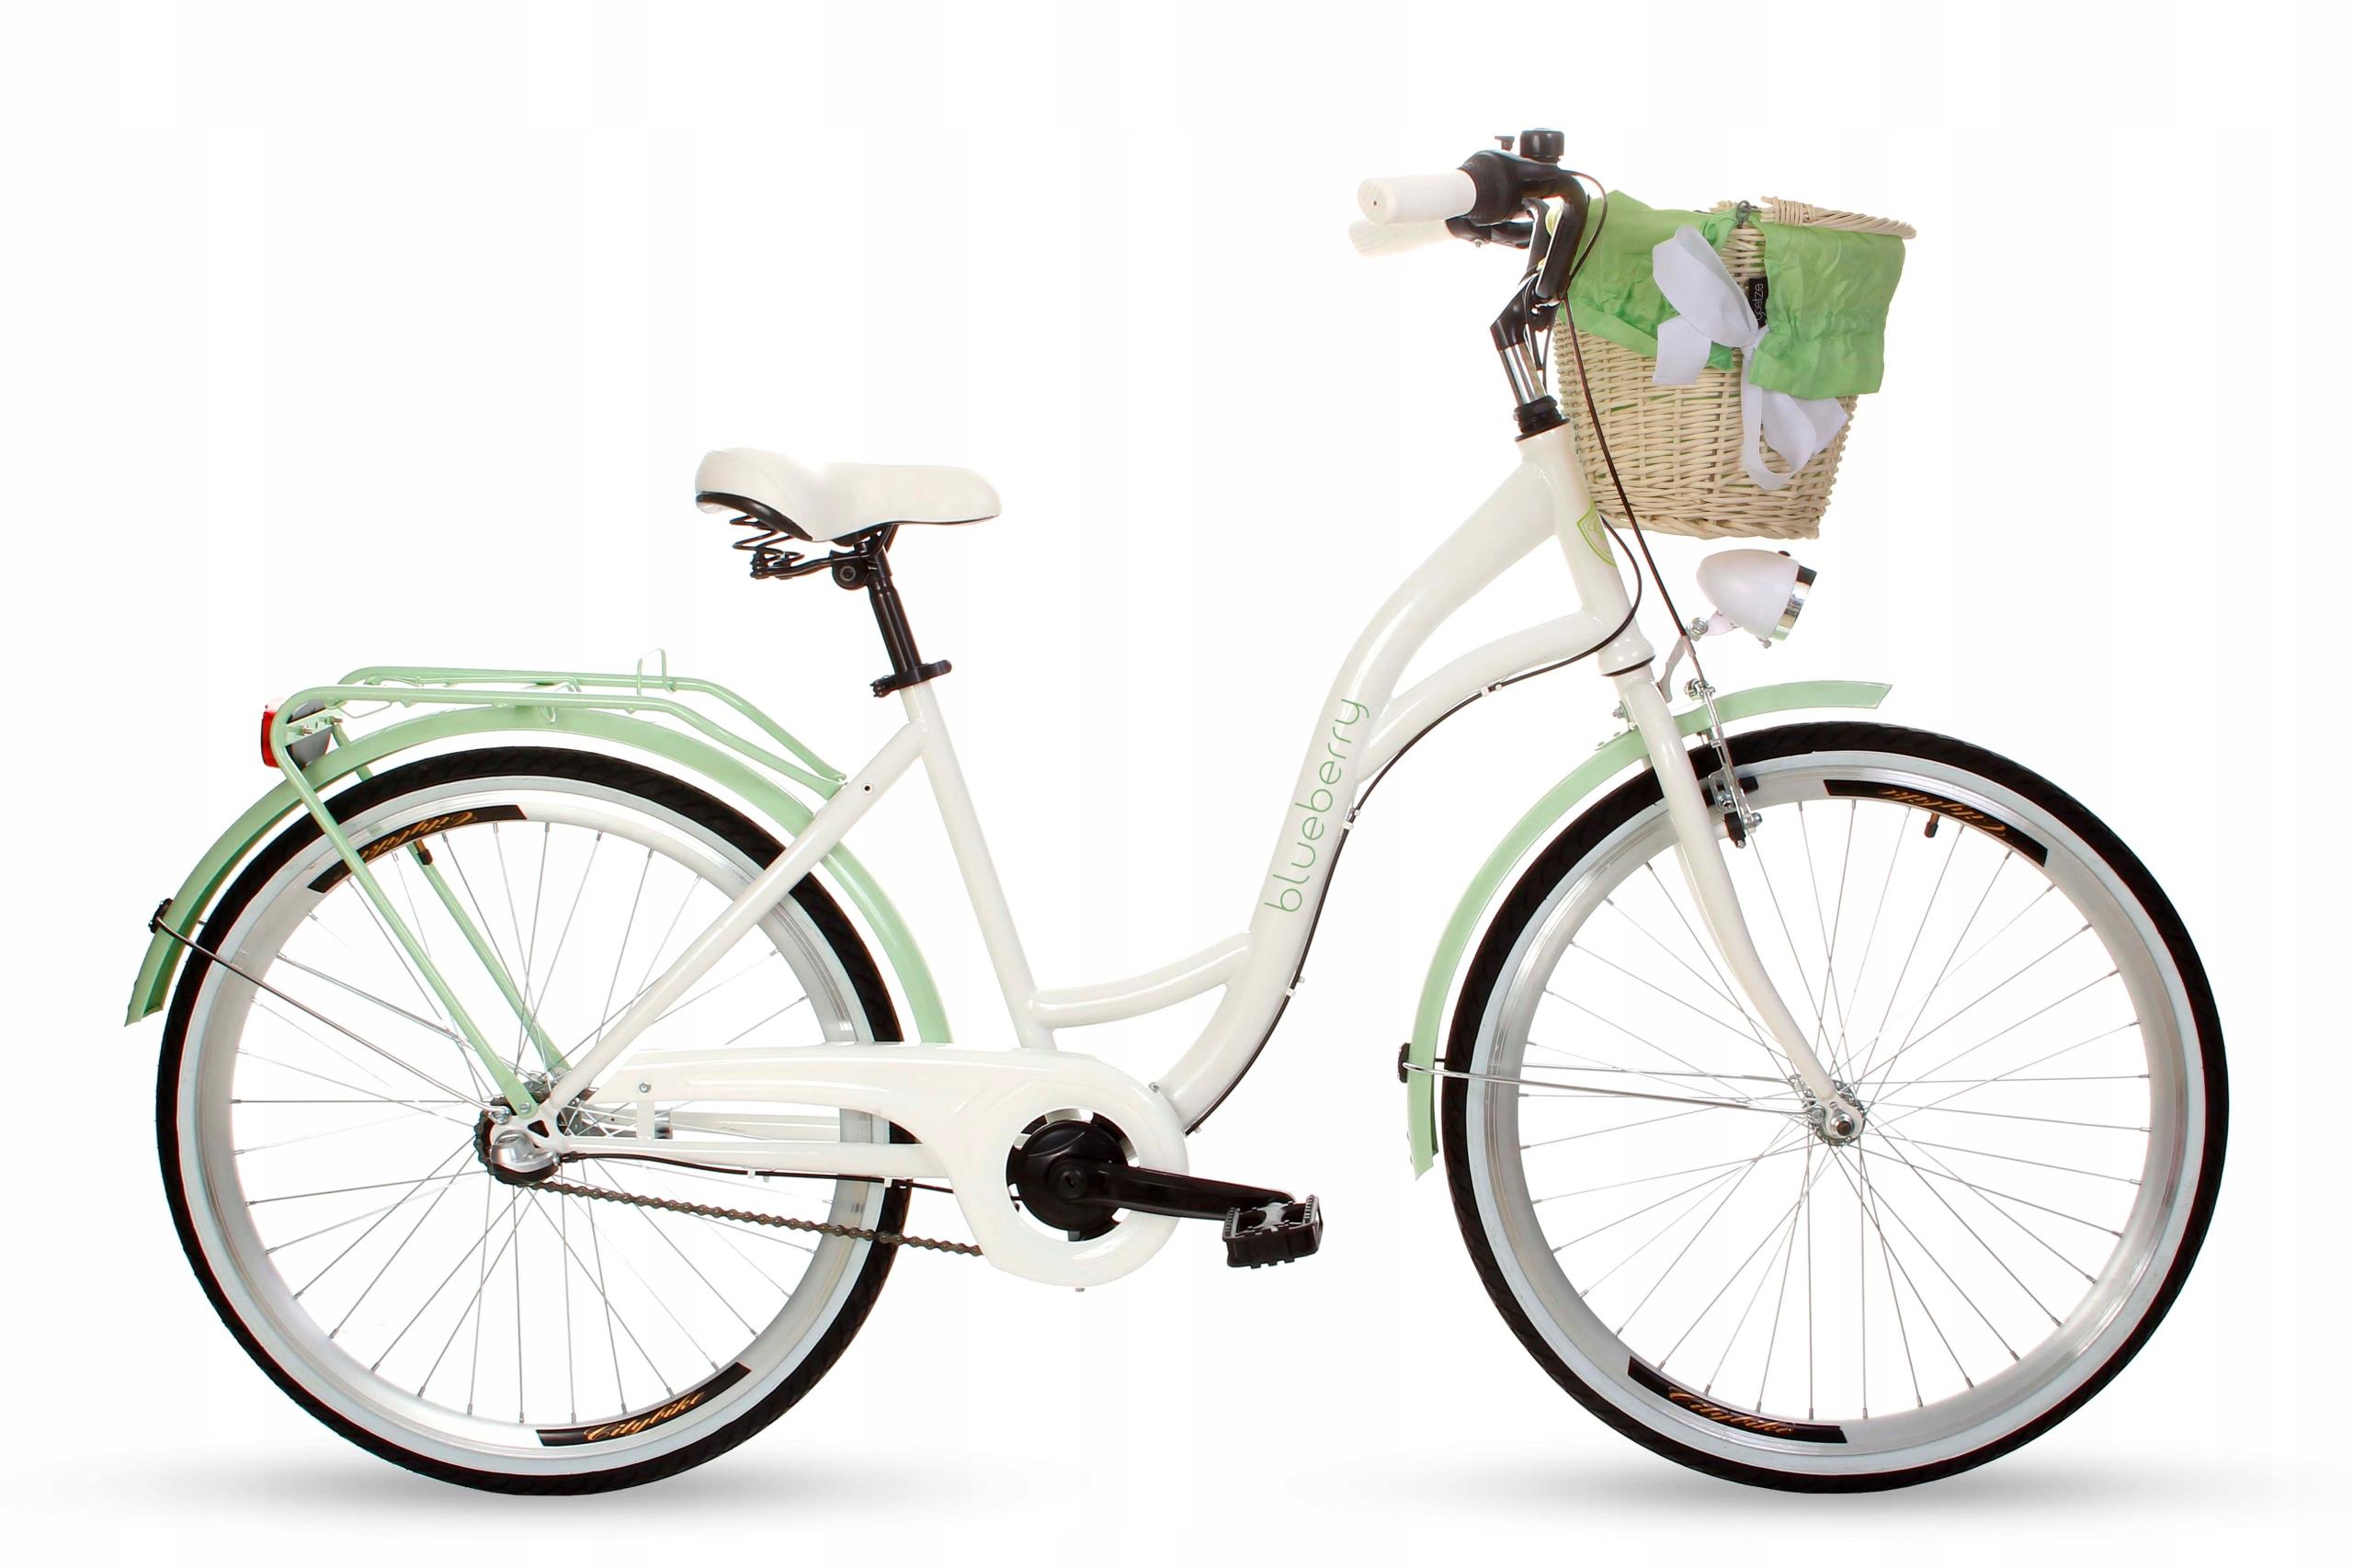 "Dámsky mestský bicykel Goetze BLUEBERRY 26 3b košík!  Veľkosť kolies ("") 26"